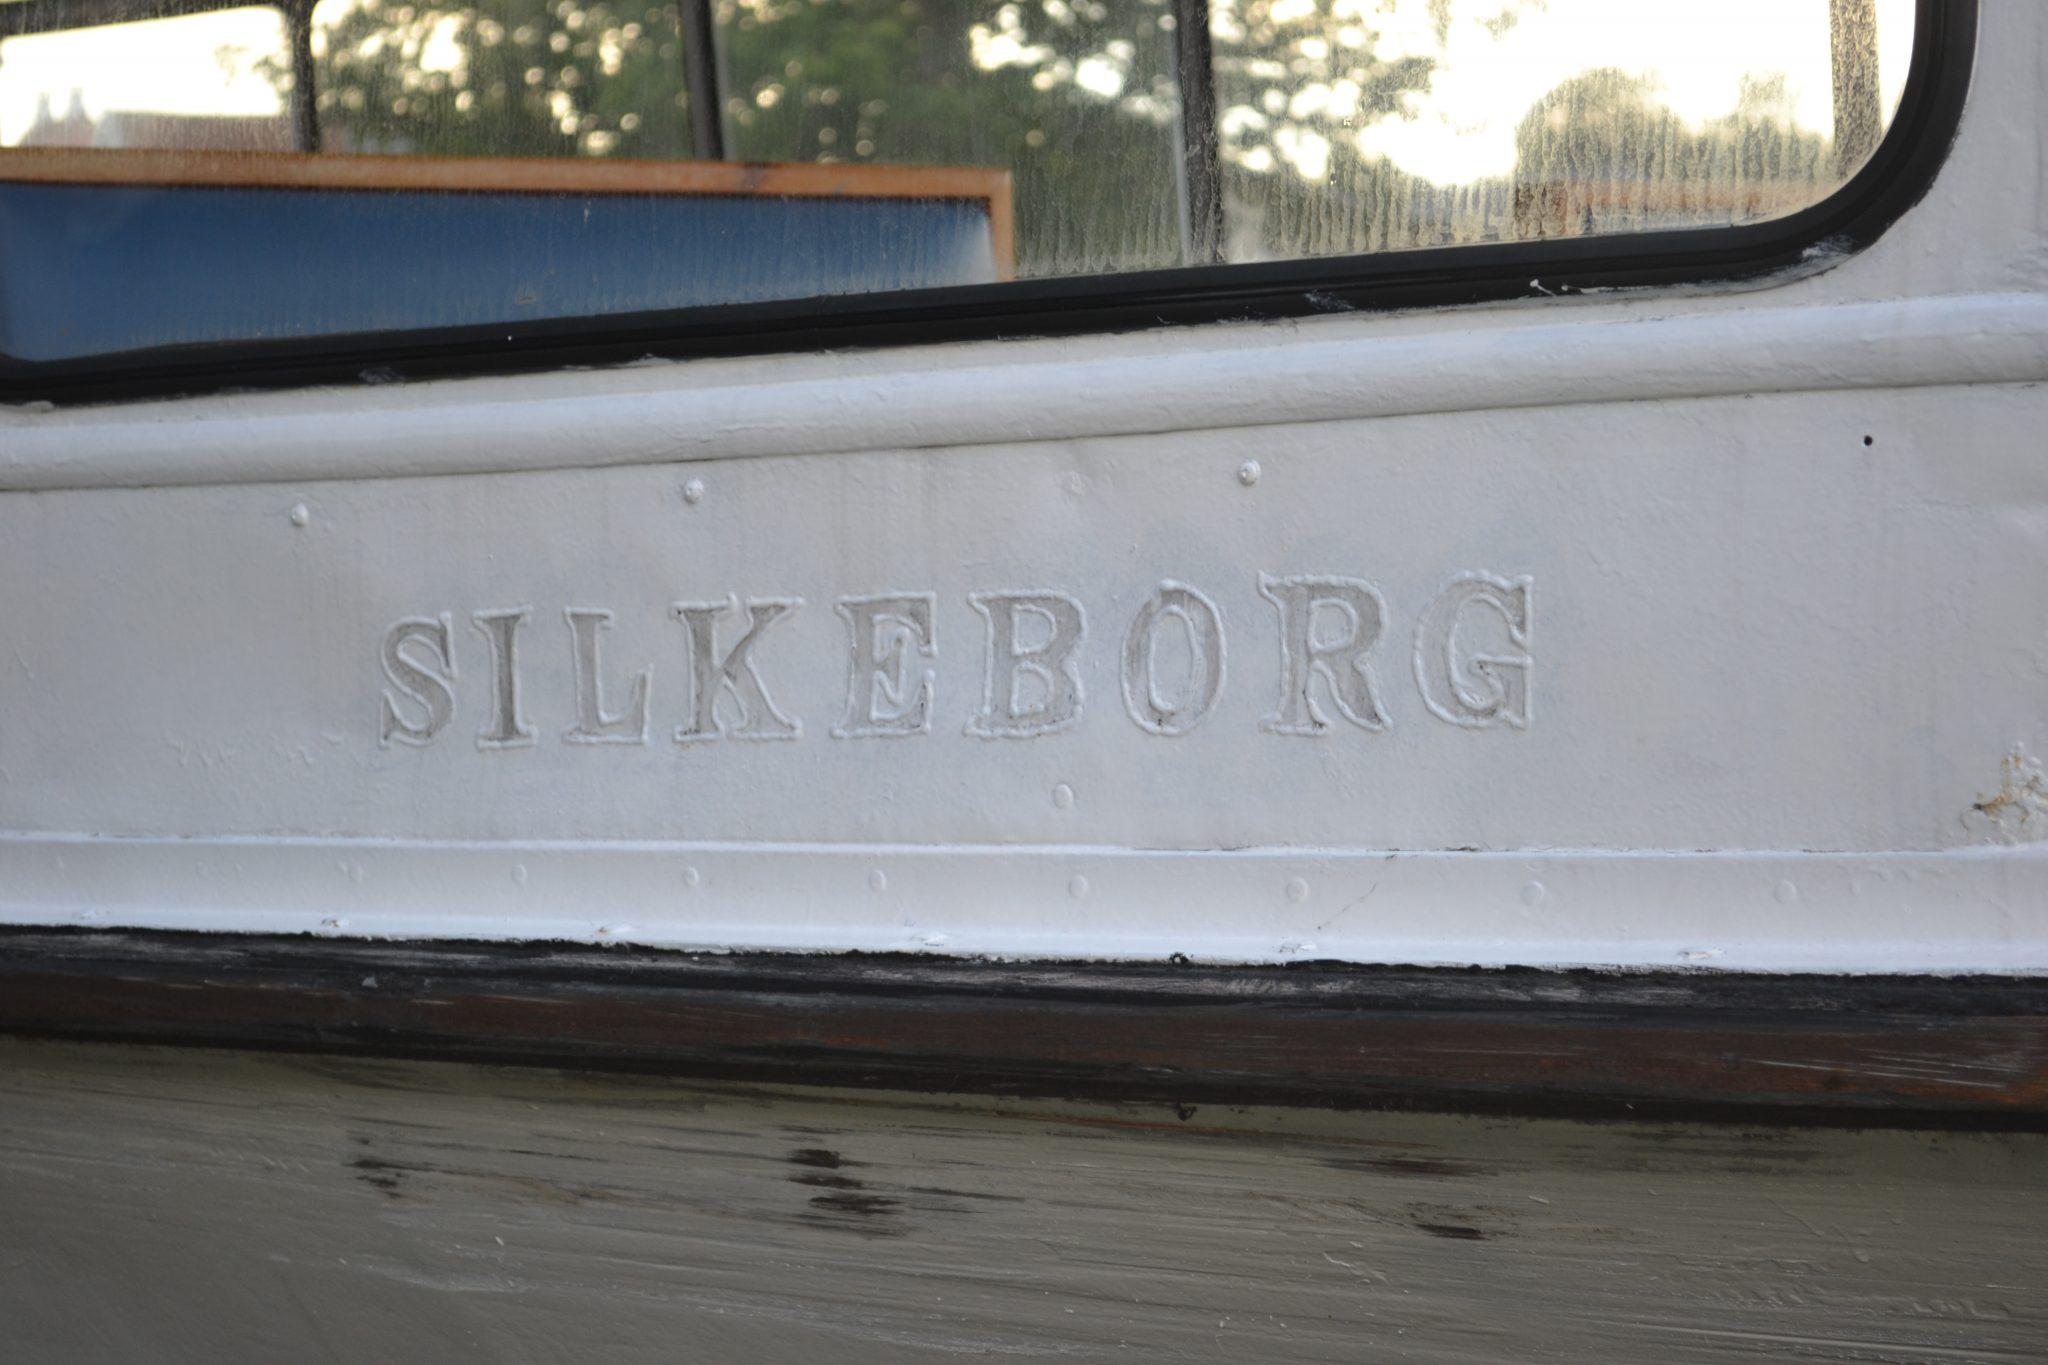 Silkeborg | Dänemark 2015 - DSC 0209